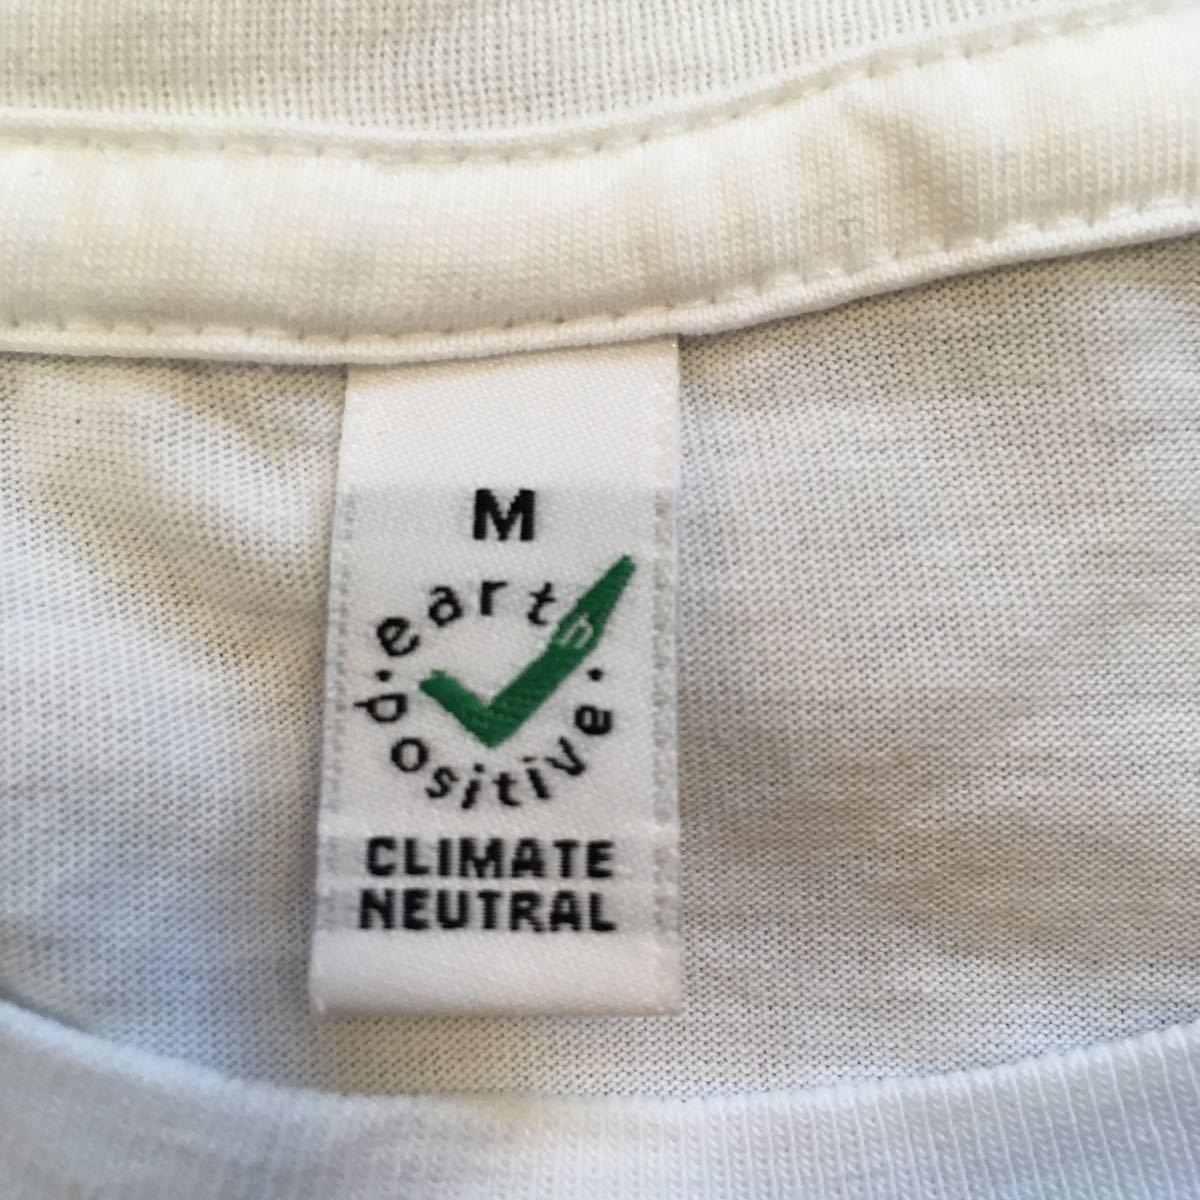 Aphex Twin エイフェックスツイン 半袖Tシャツ Mサイズ 公式グッズ 海外公式サイト購入_画像3